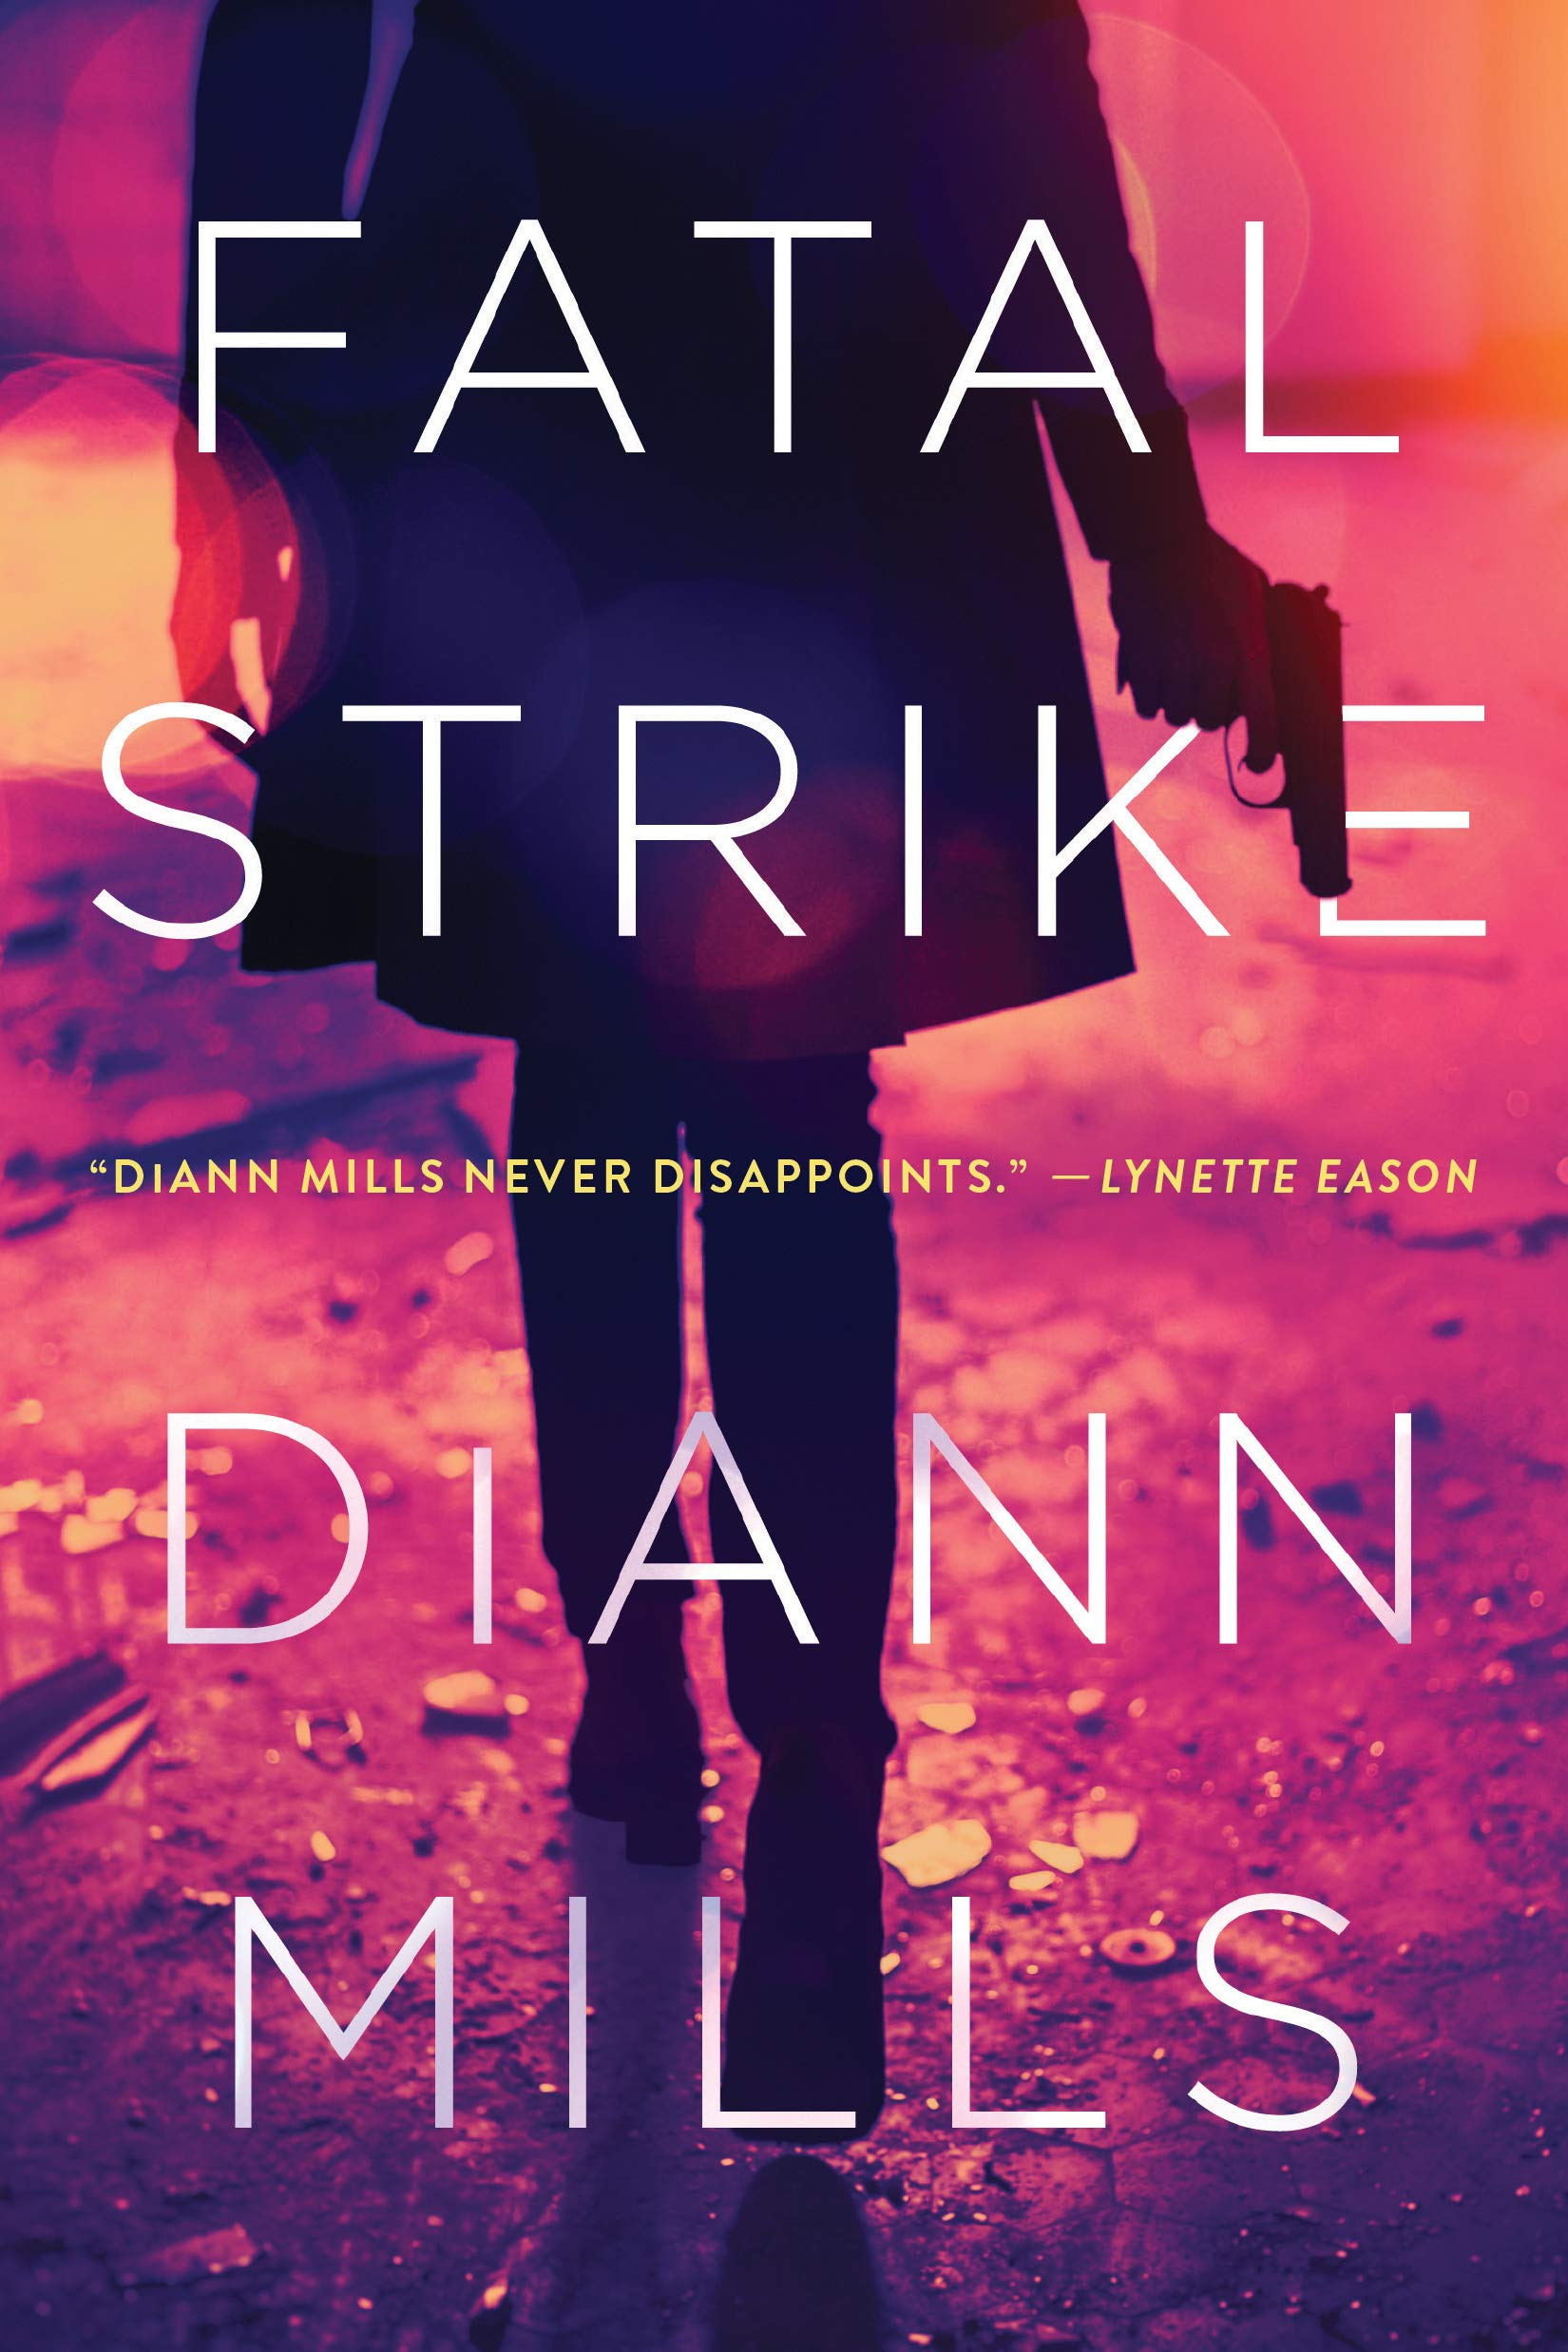 Fatal Strike {A Book Review}